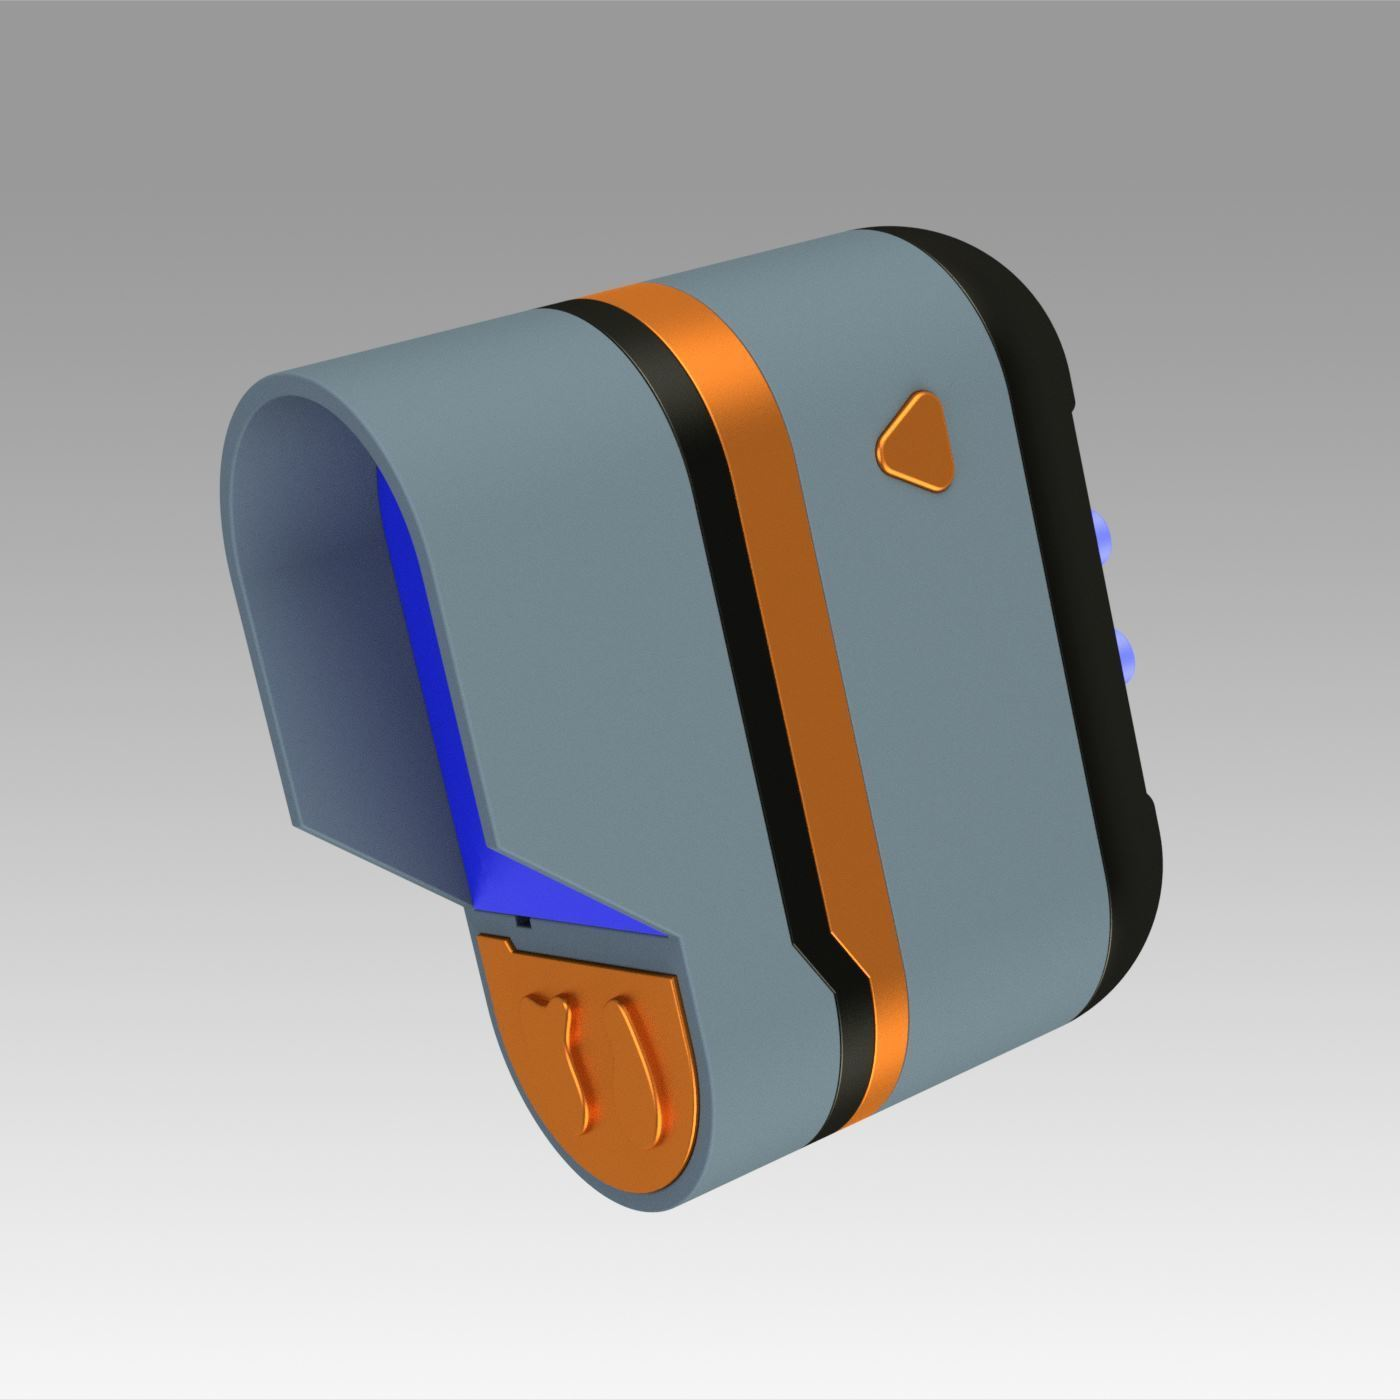 1.jpg Download OBJ file Star Trek Prop Dr Phlox Scanner replica prop cosplay • 3D printer object, Blackeveryday